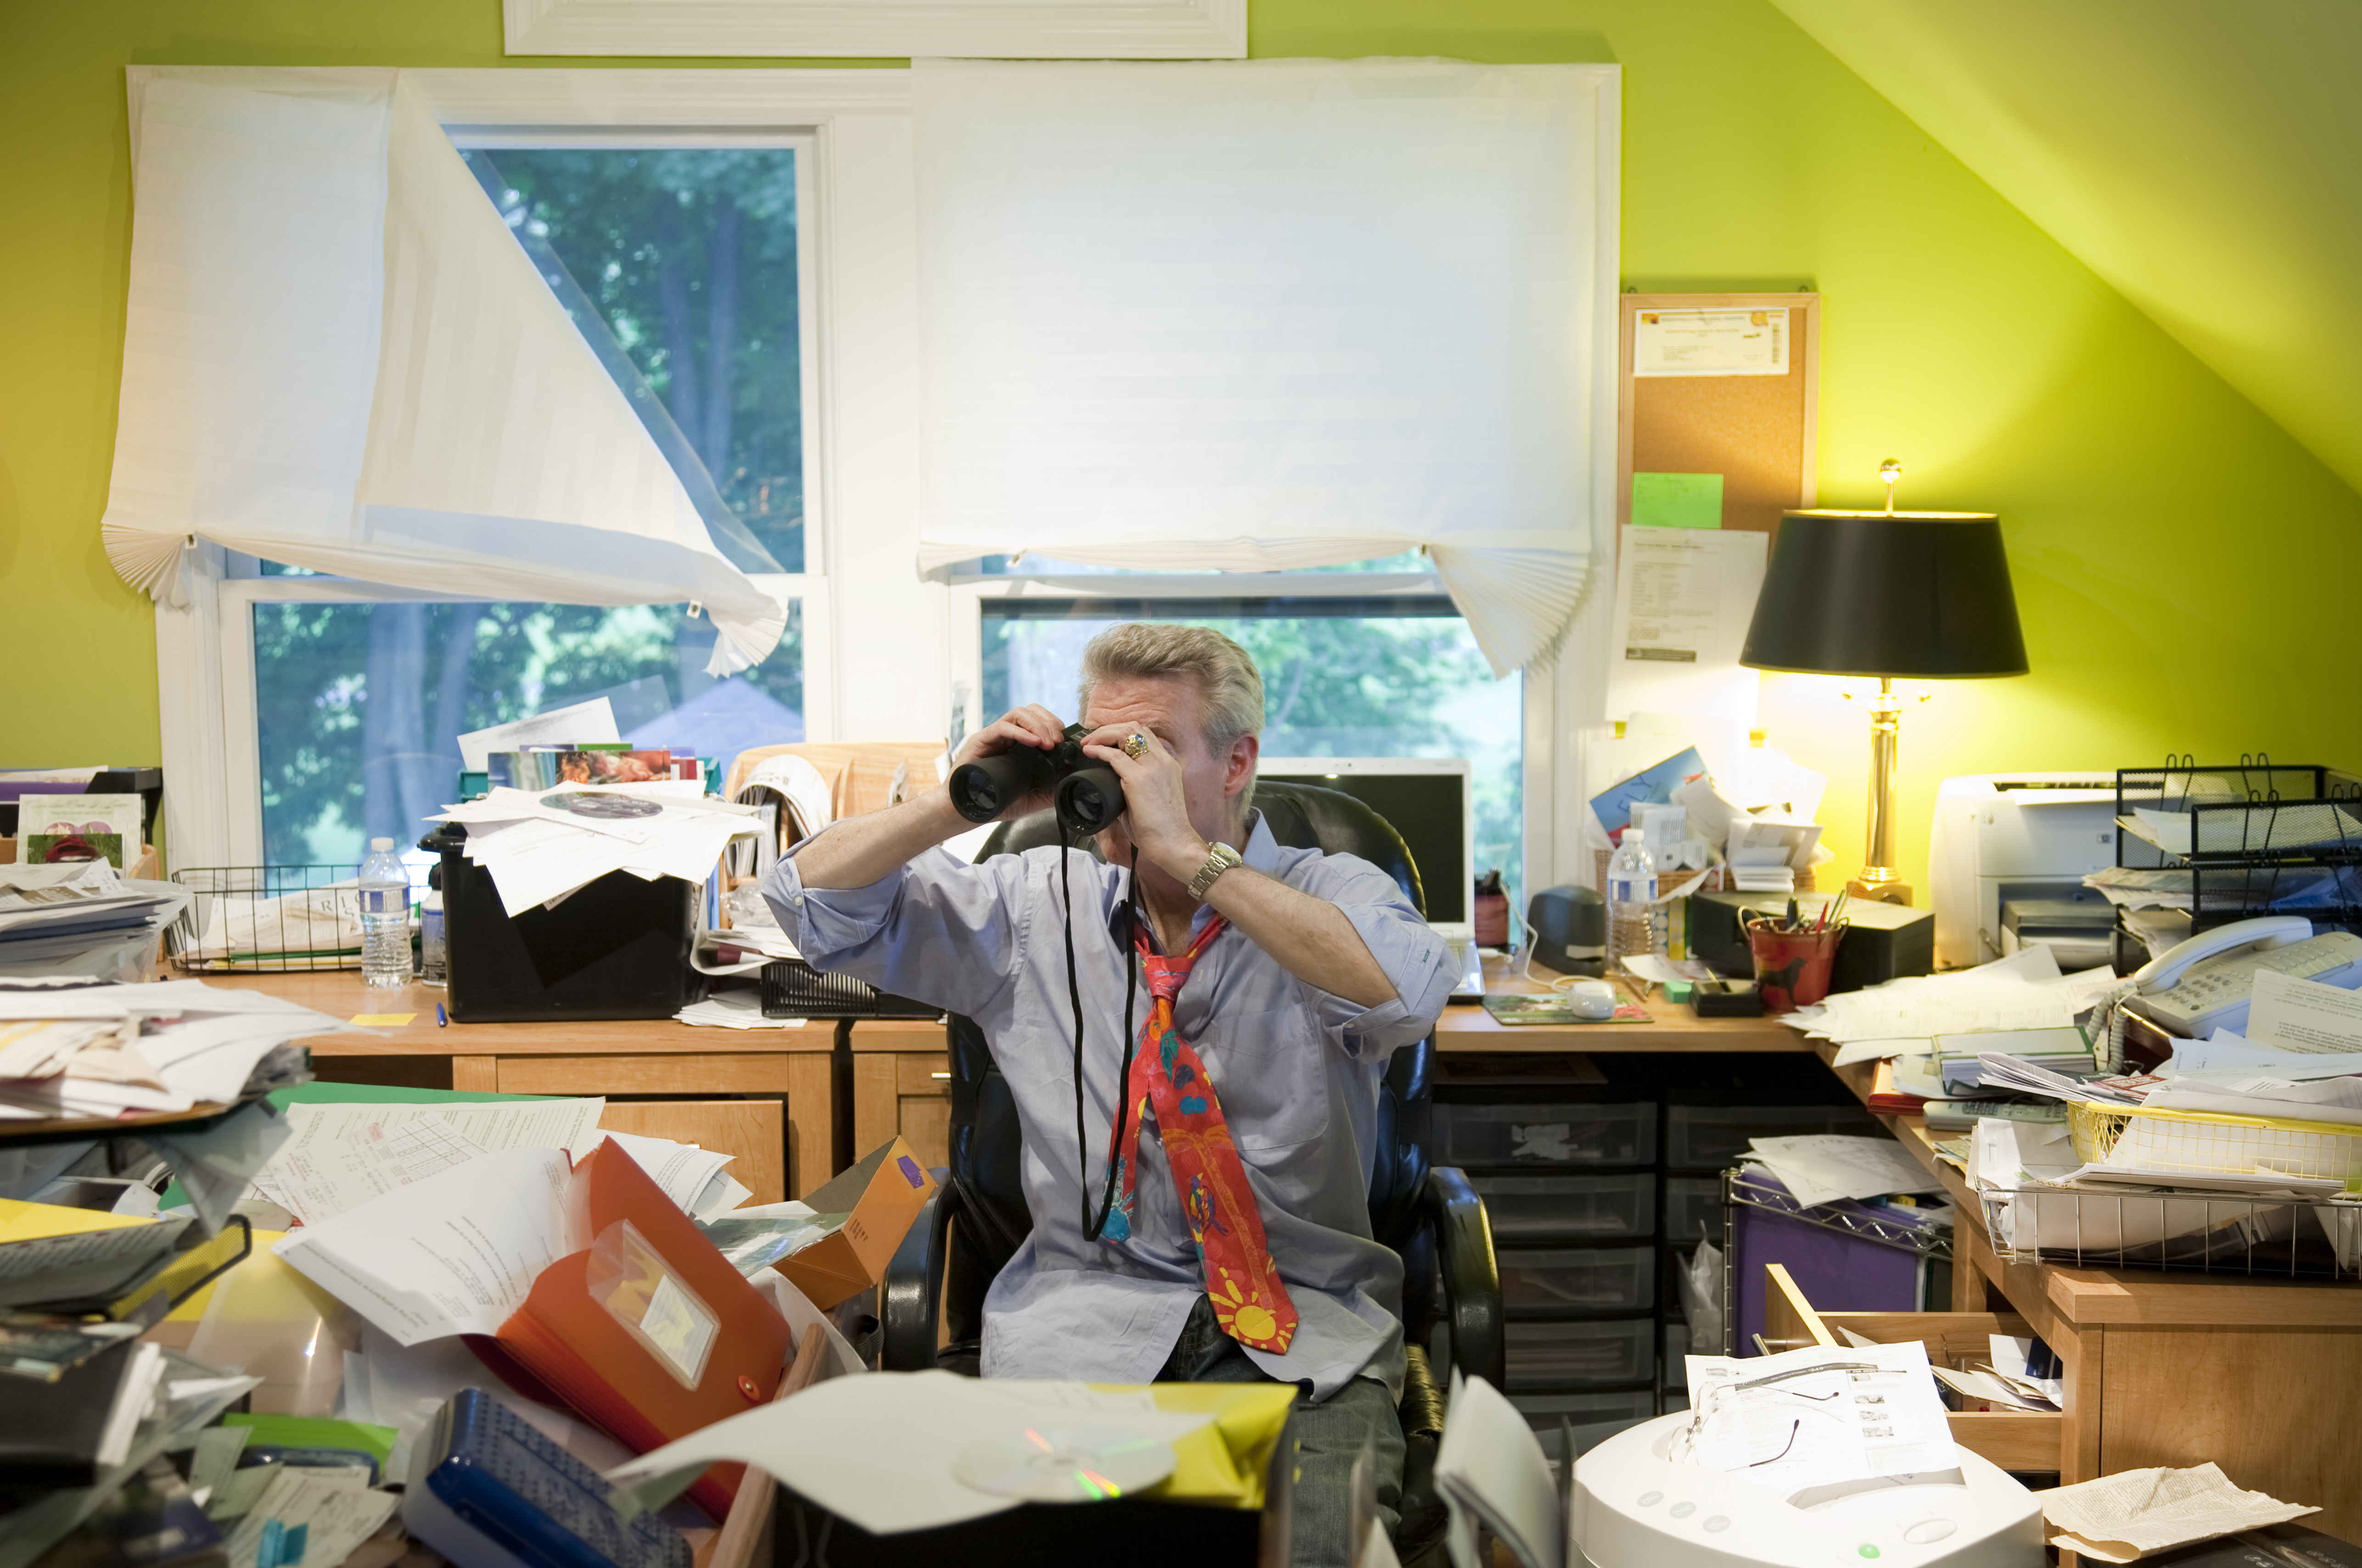 Baby Boomer w/ Binoculars in Messy Office